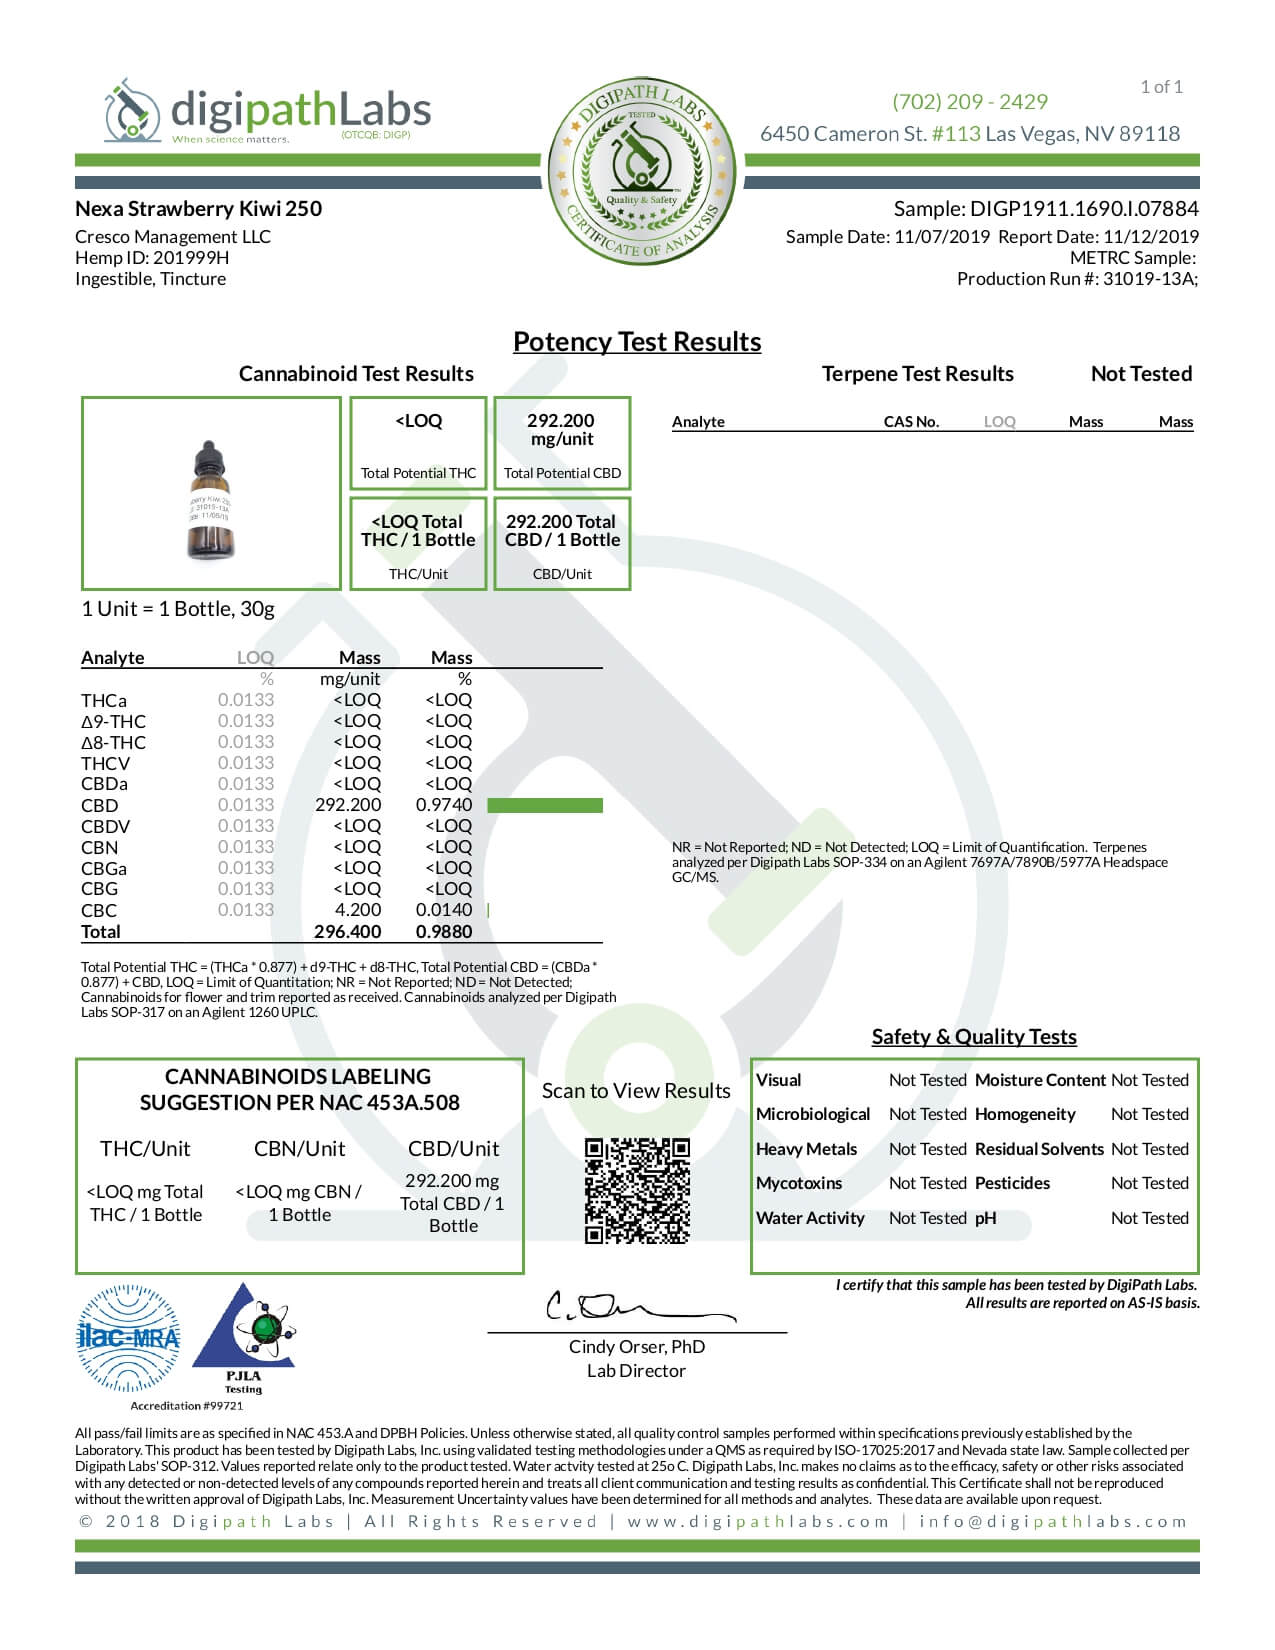 Nexa CBD Tincture Strawberry Kiwi 250mg Lab Report